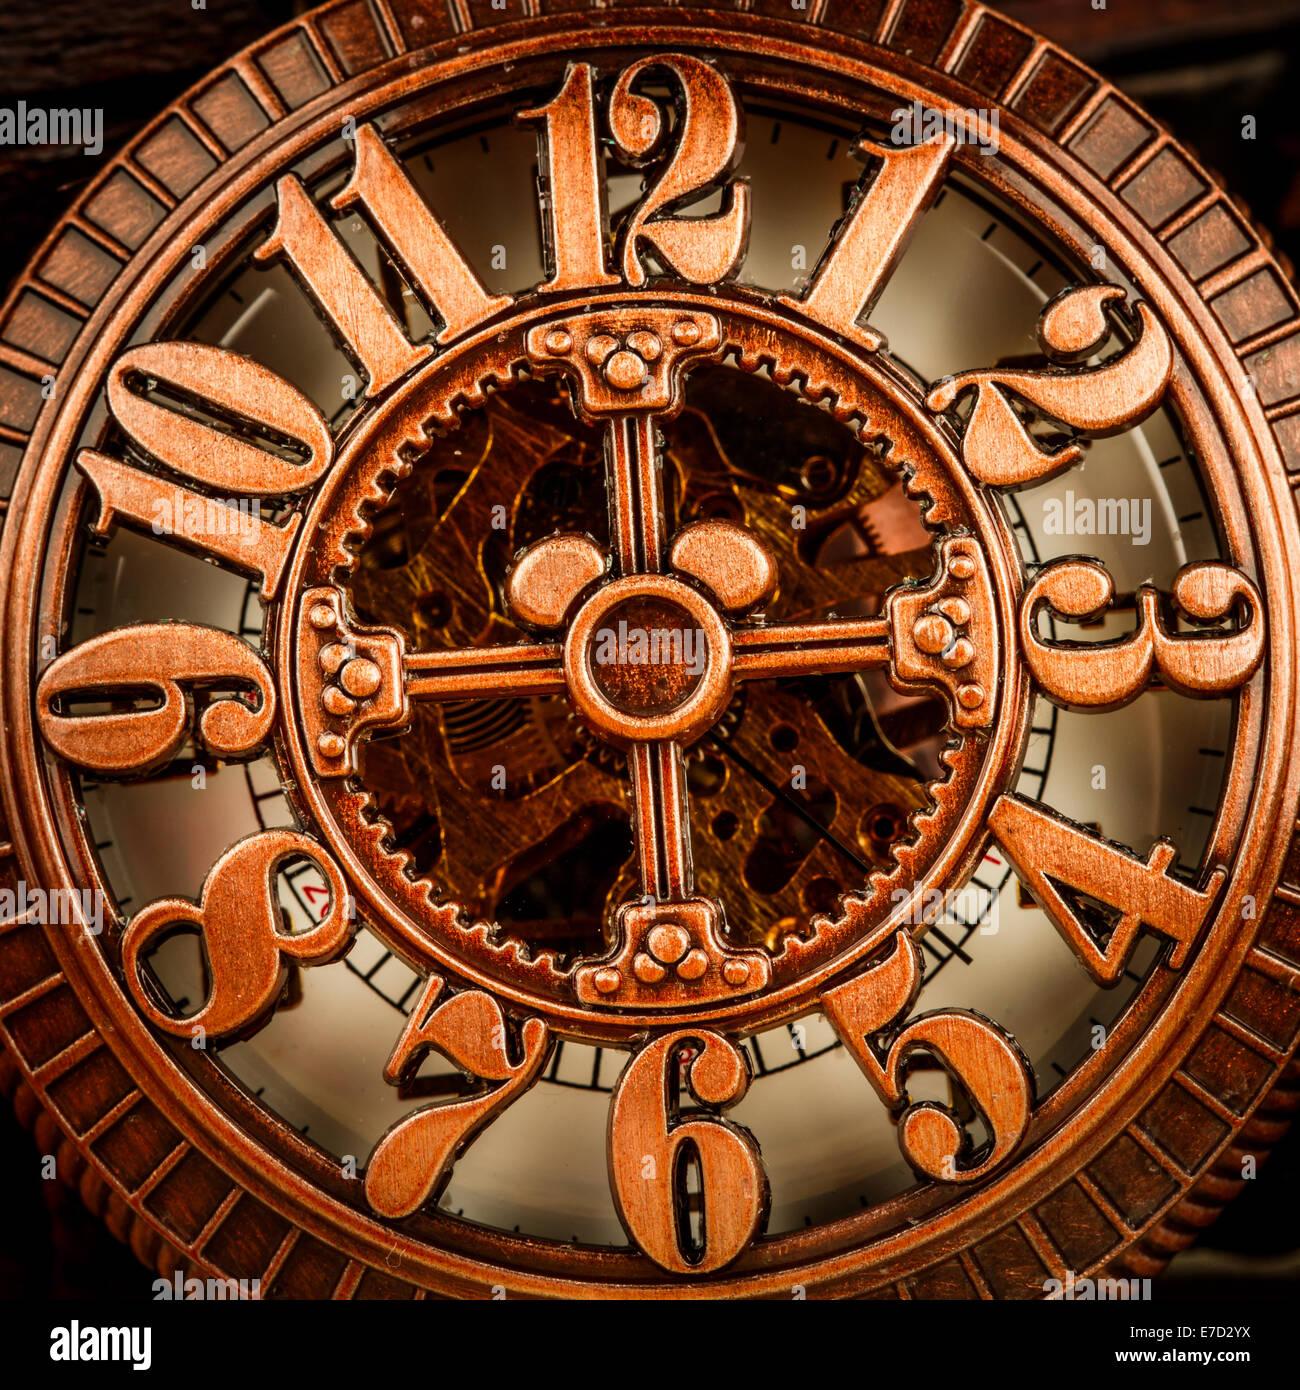 Antique clock dial close-up. Vintage pocket watch. Stock Photo